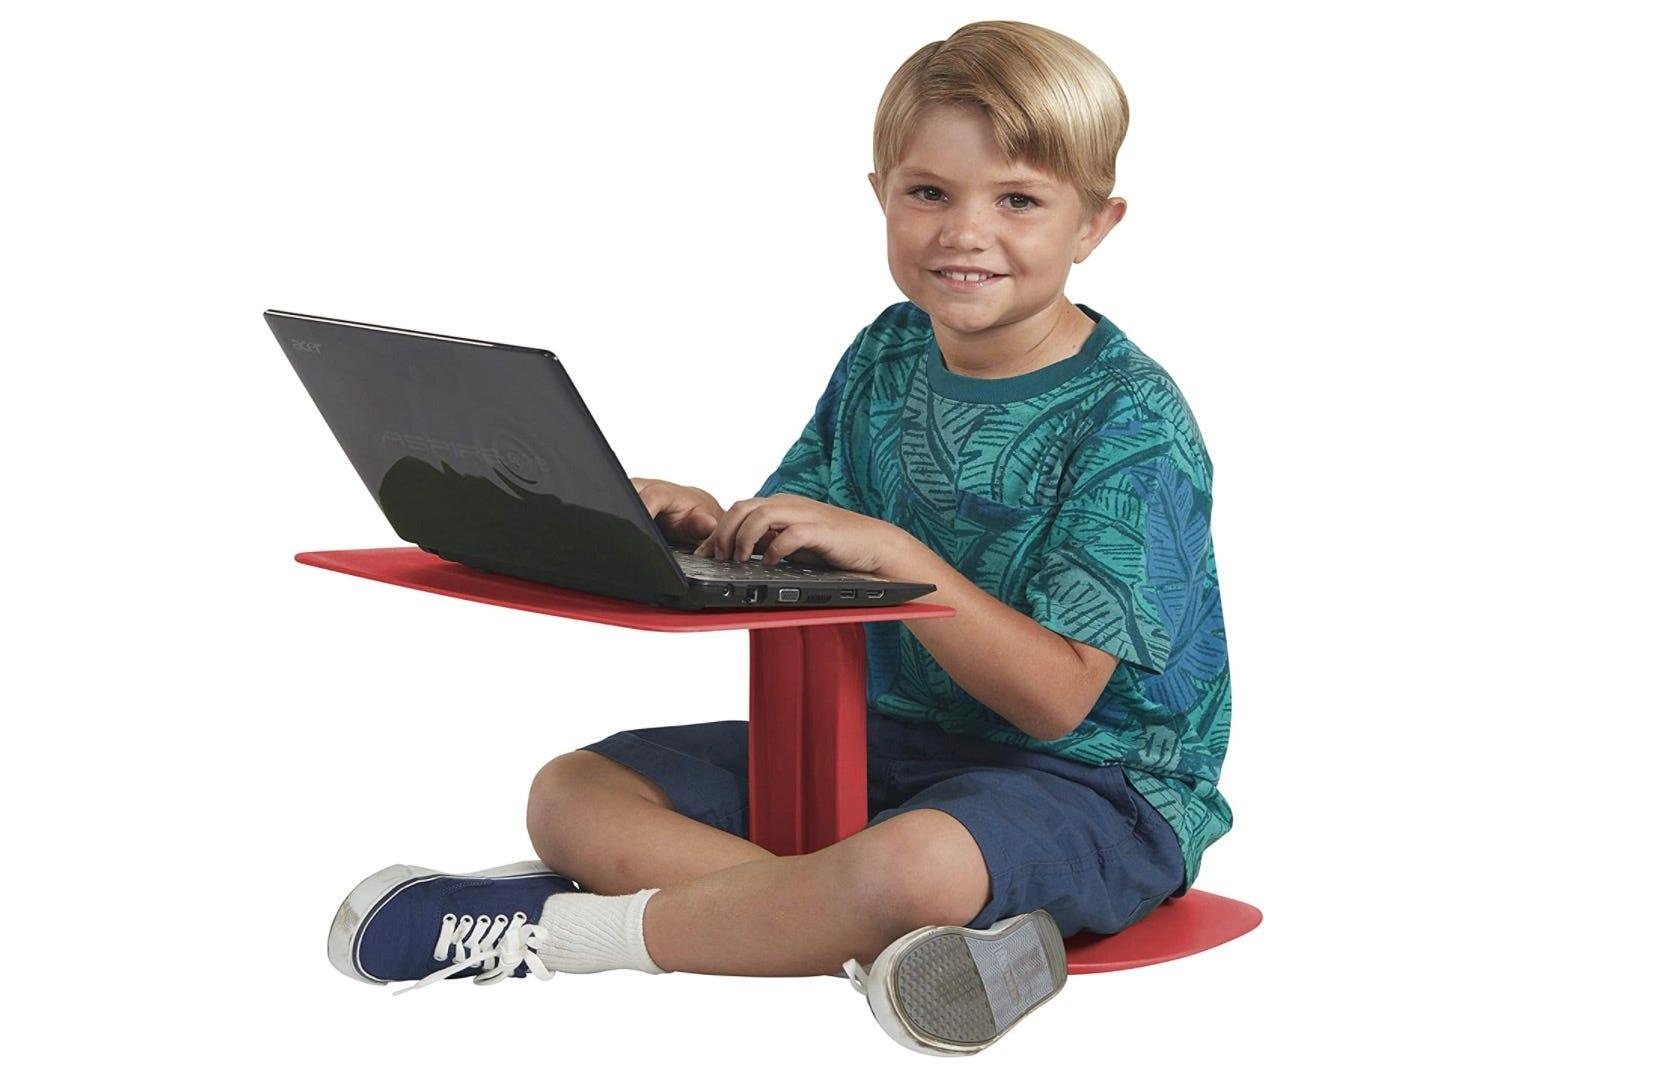 plastic lap desk for kids